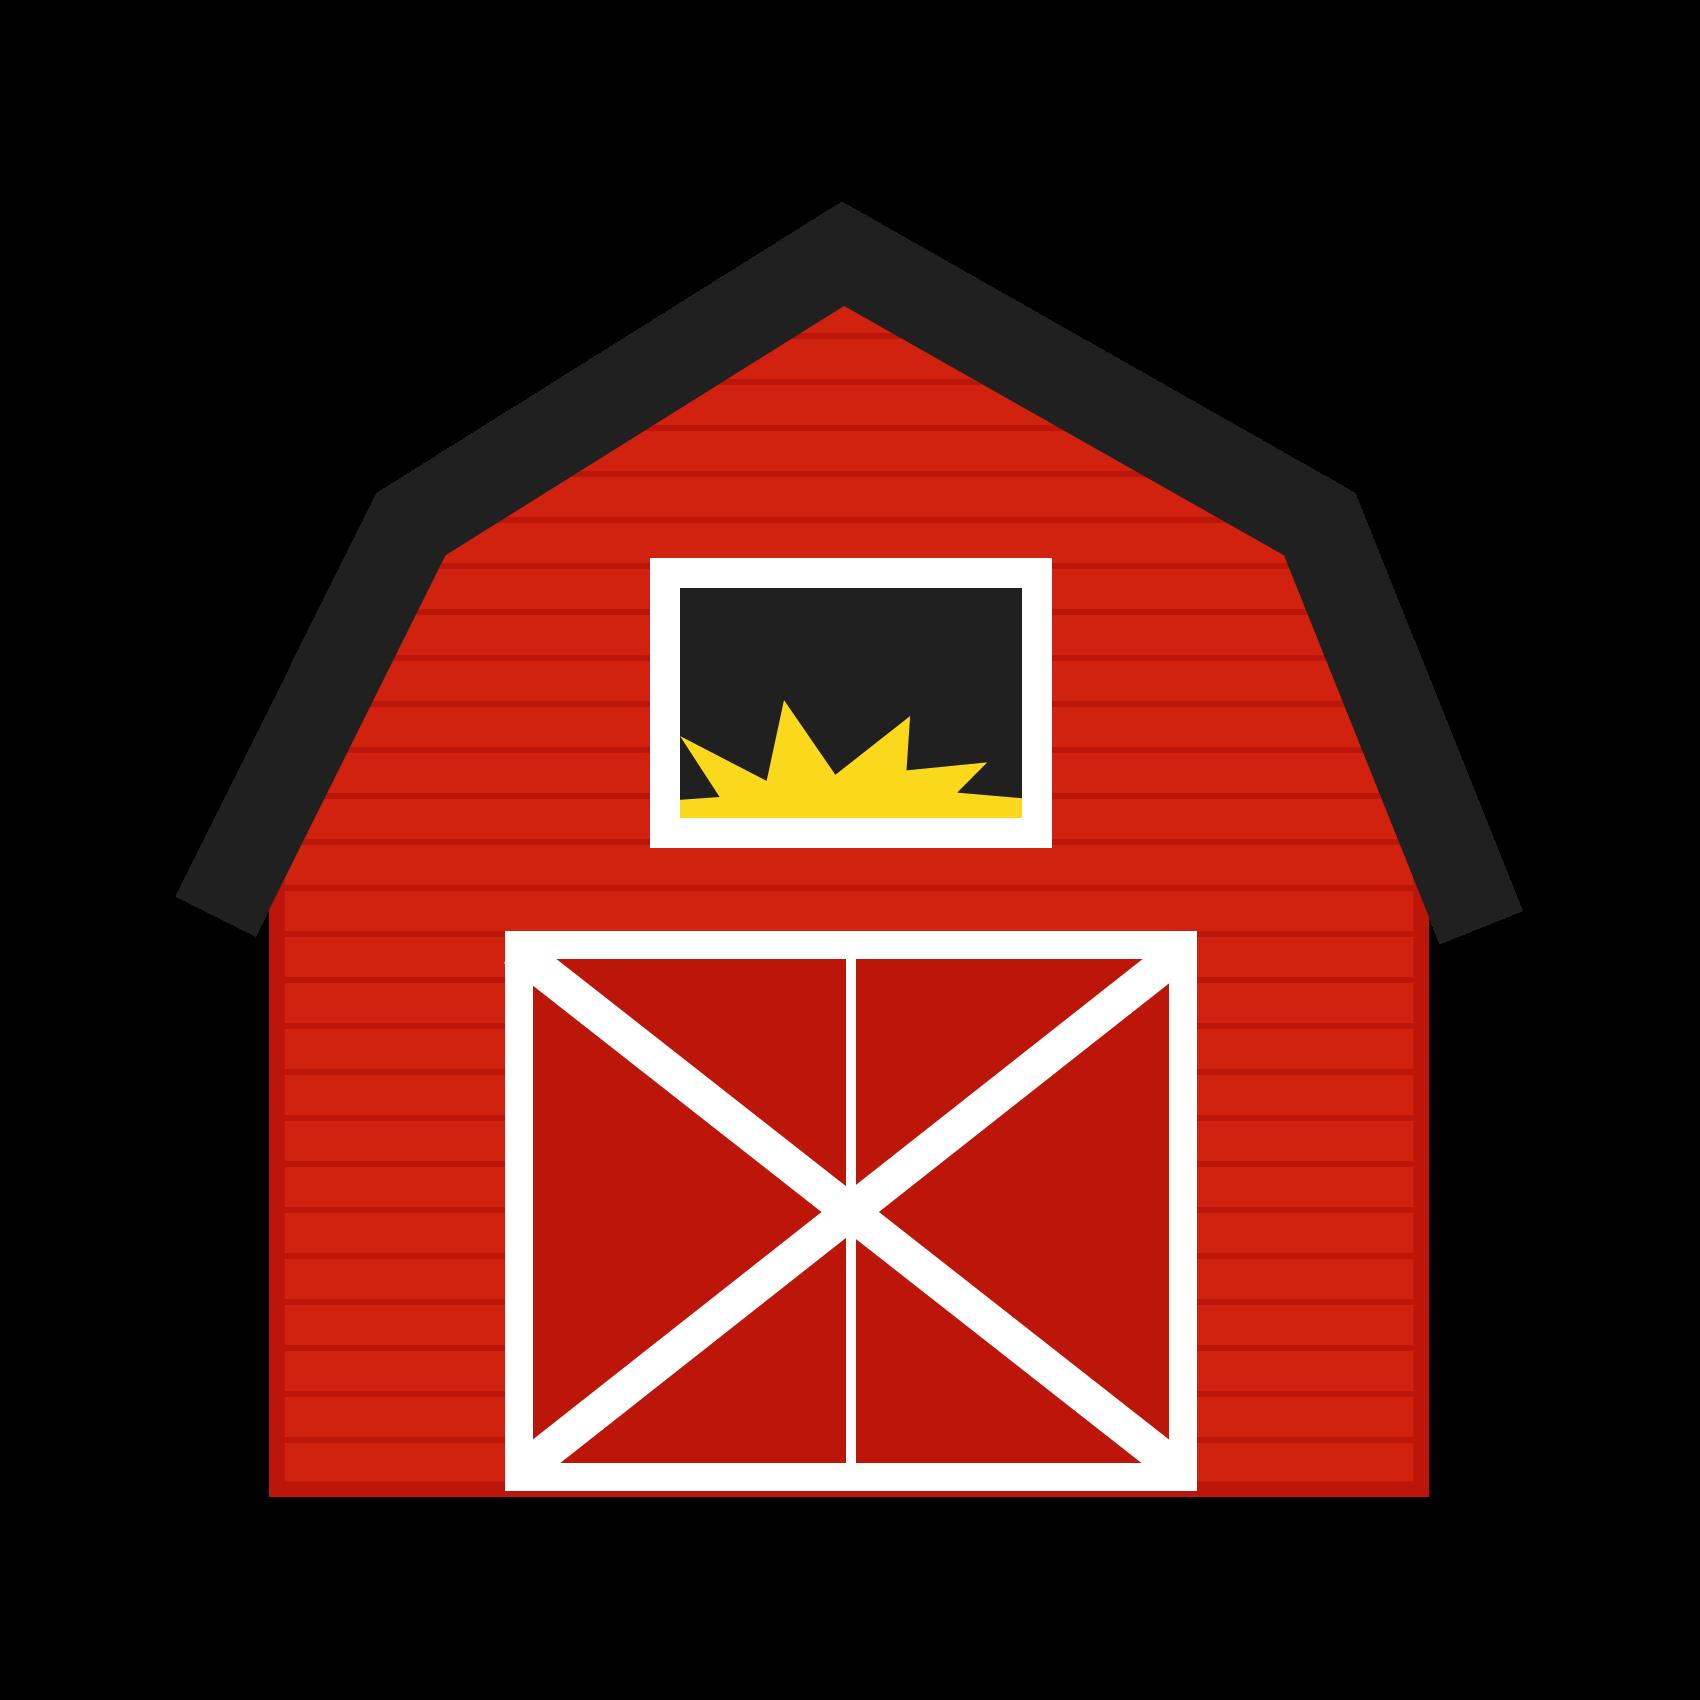 Barn Clipart